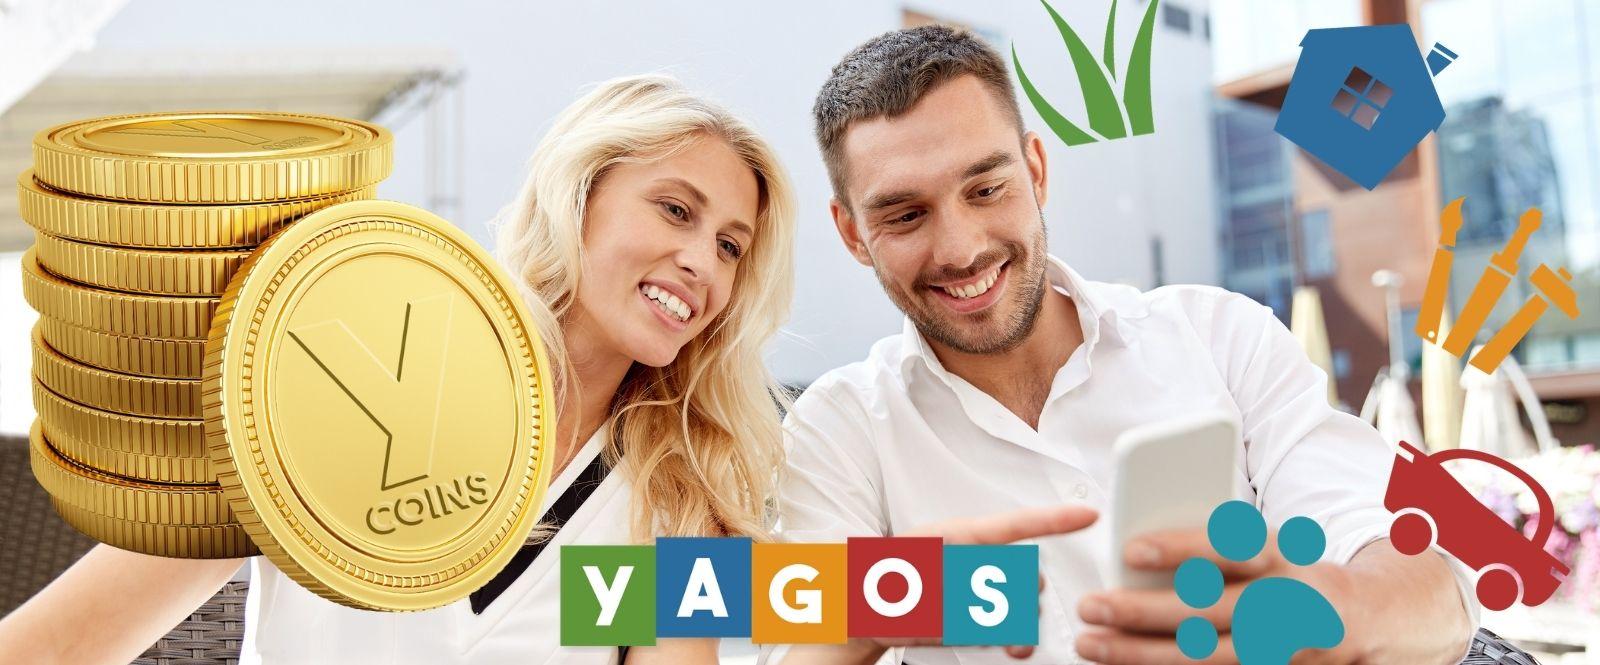 Banner-y-coins-yagos.jpg